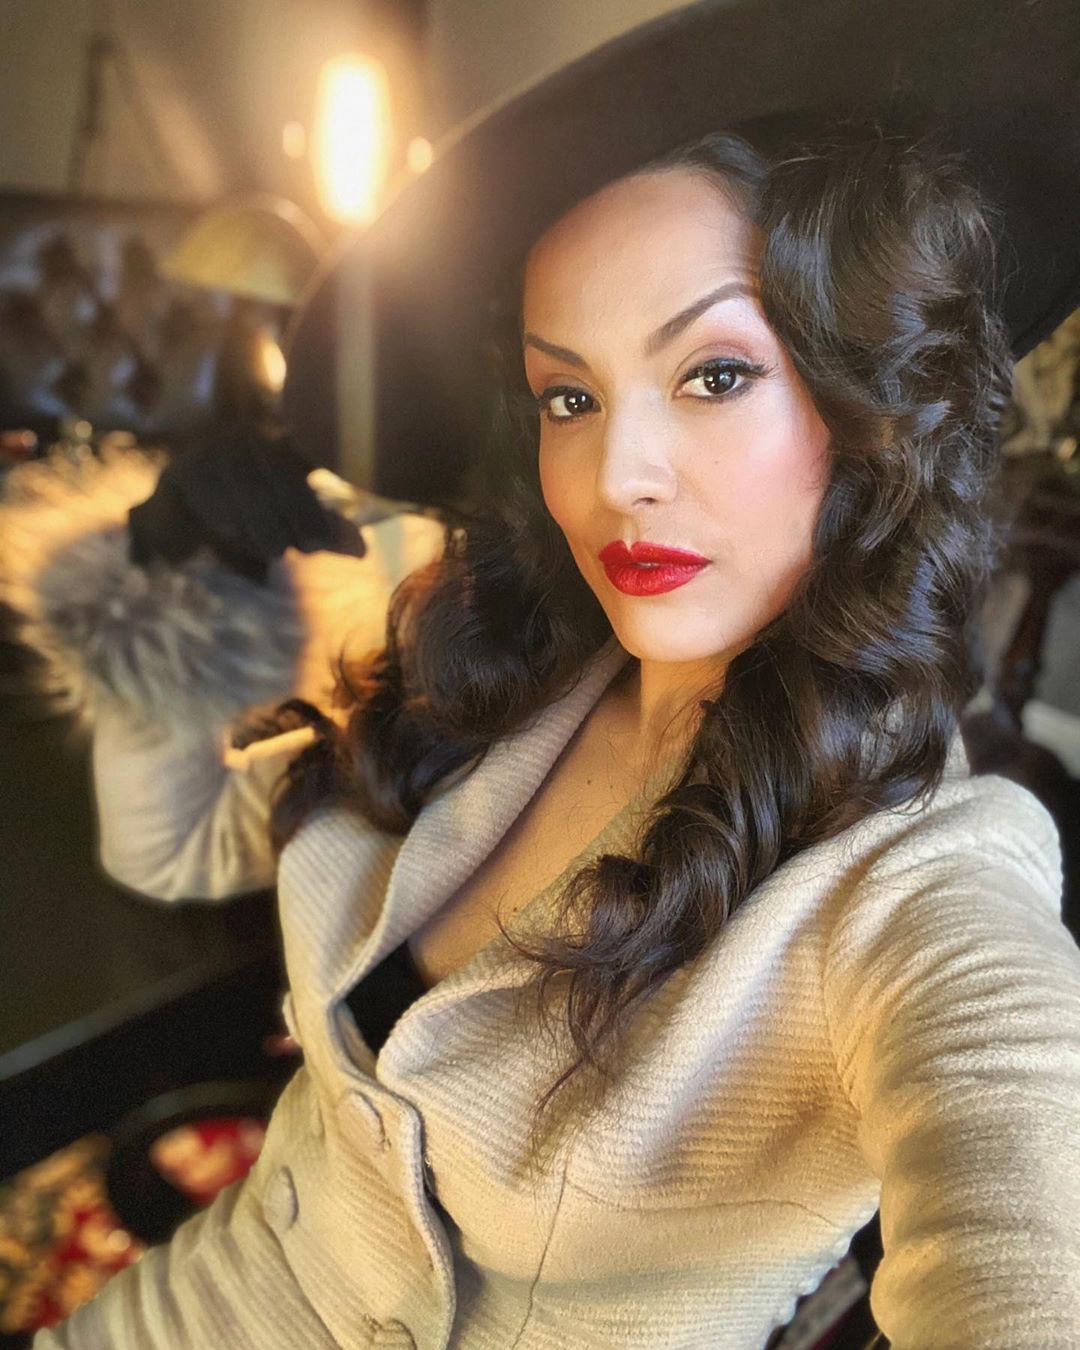 Raquel Pomplun fur outfits for girls, Face Makeup, Lips Smile